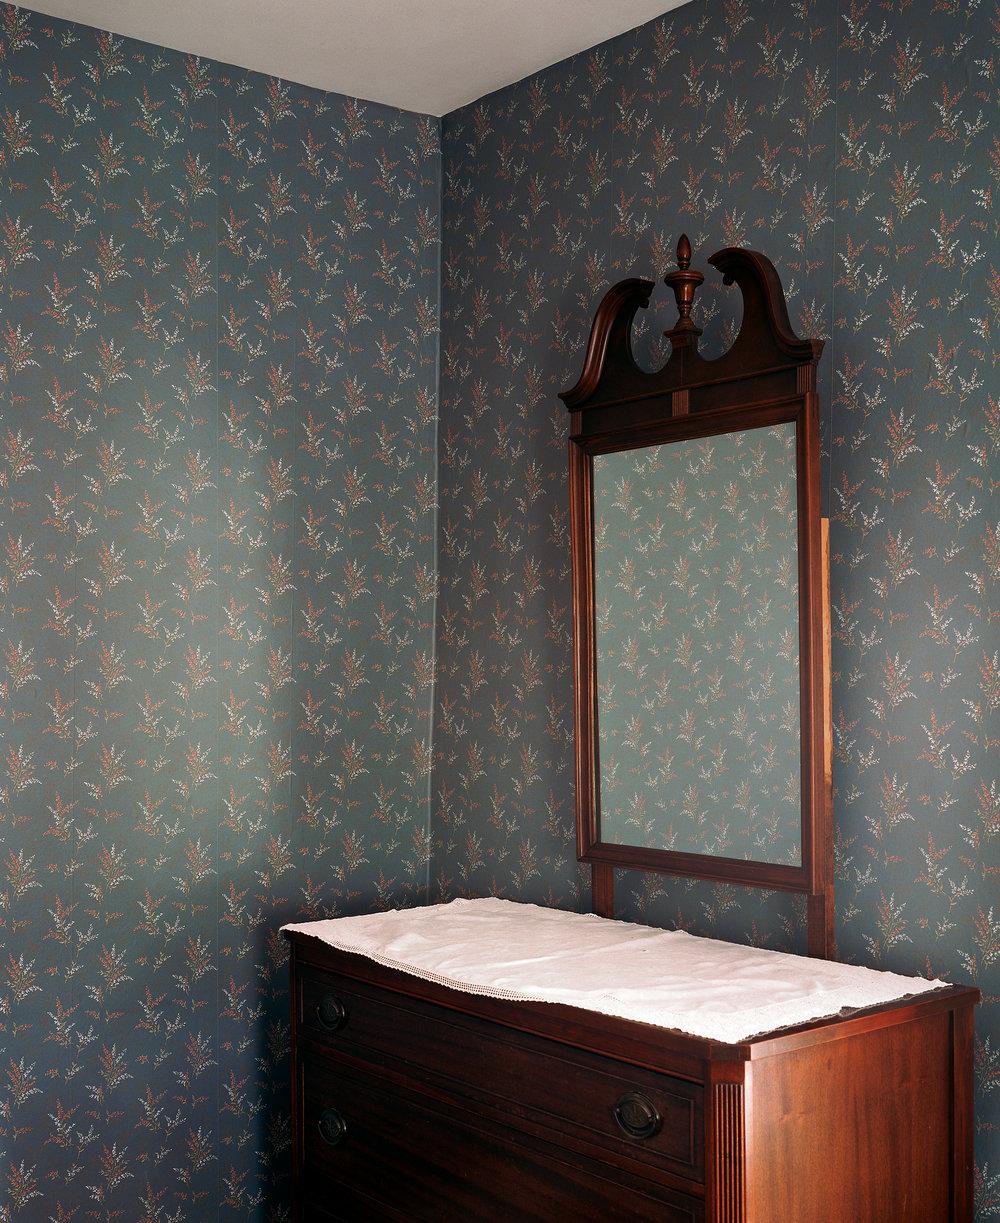 Mirror and Wall I, 2005